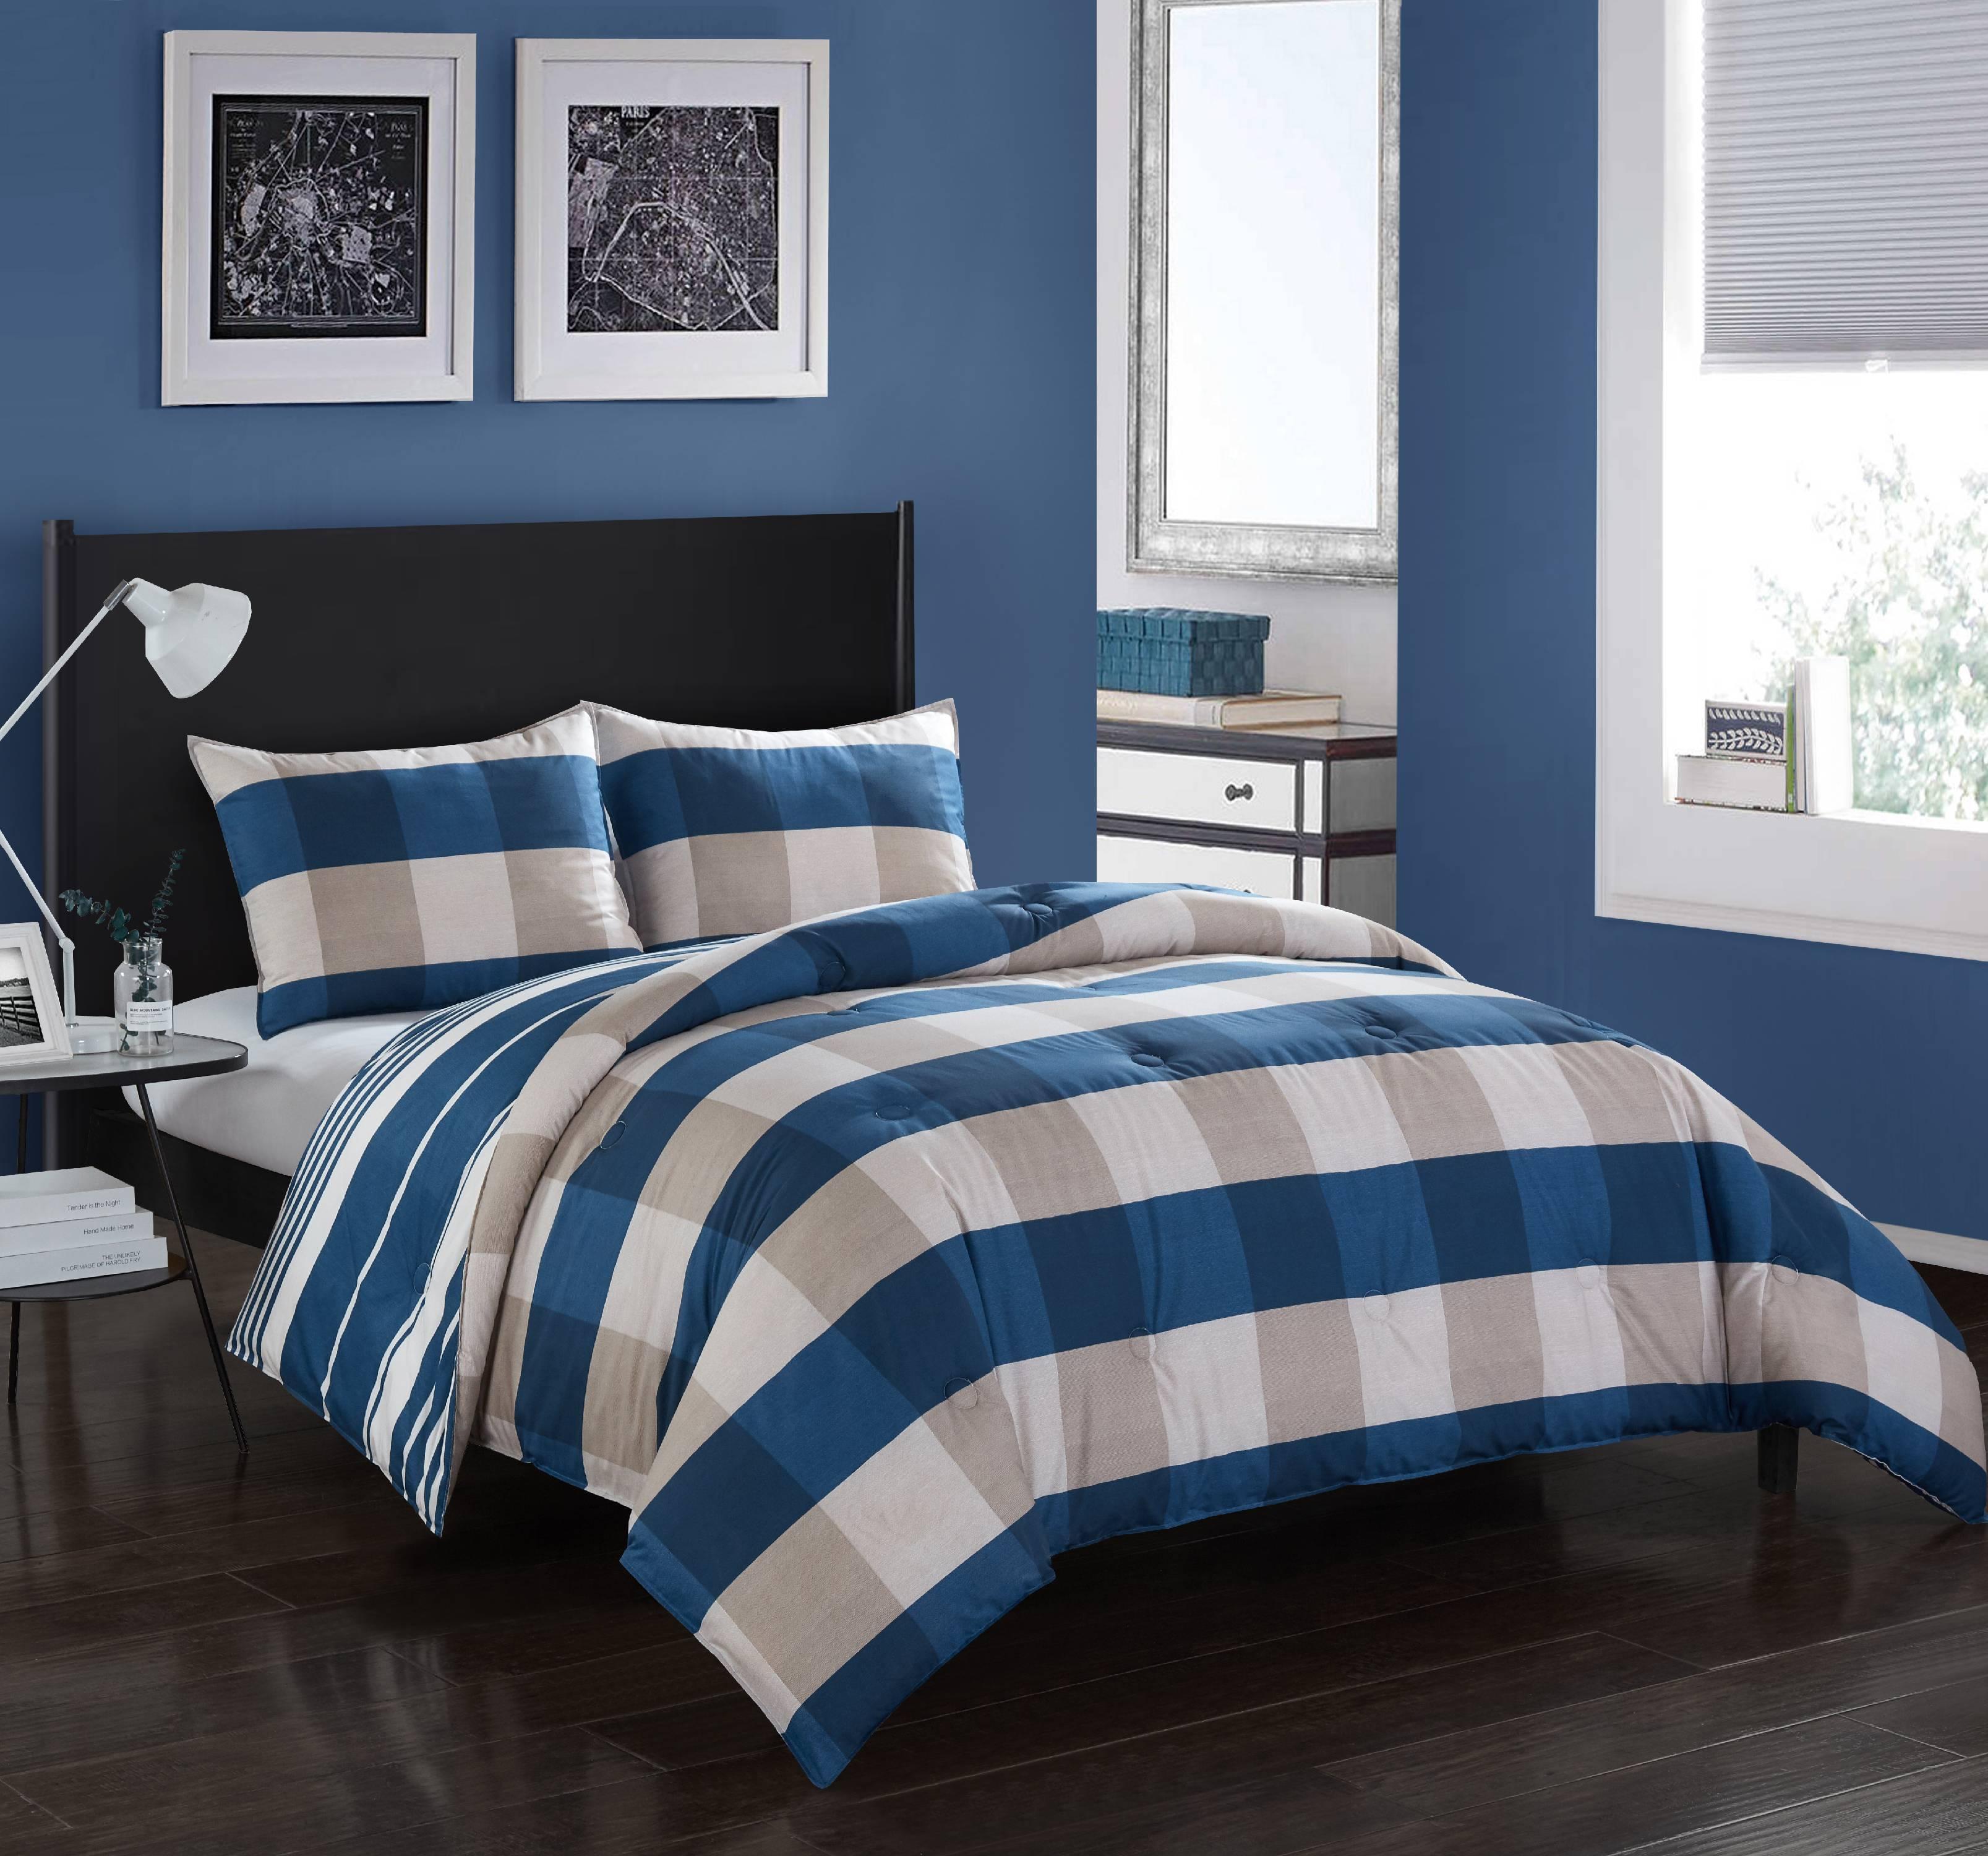 Better Homes & Gardens Alberton Plaid Comforter Set